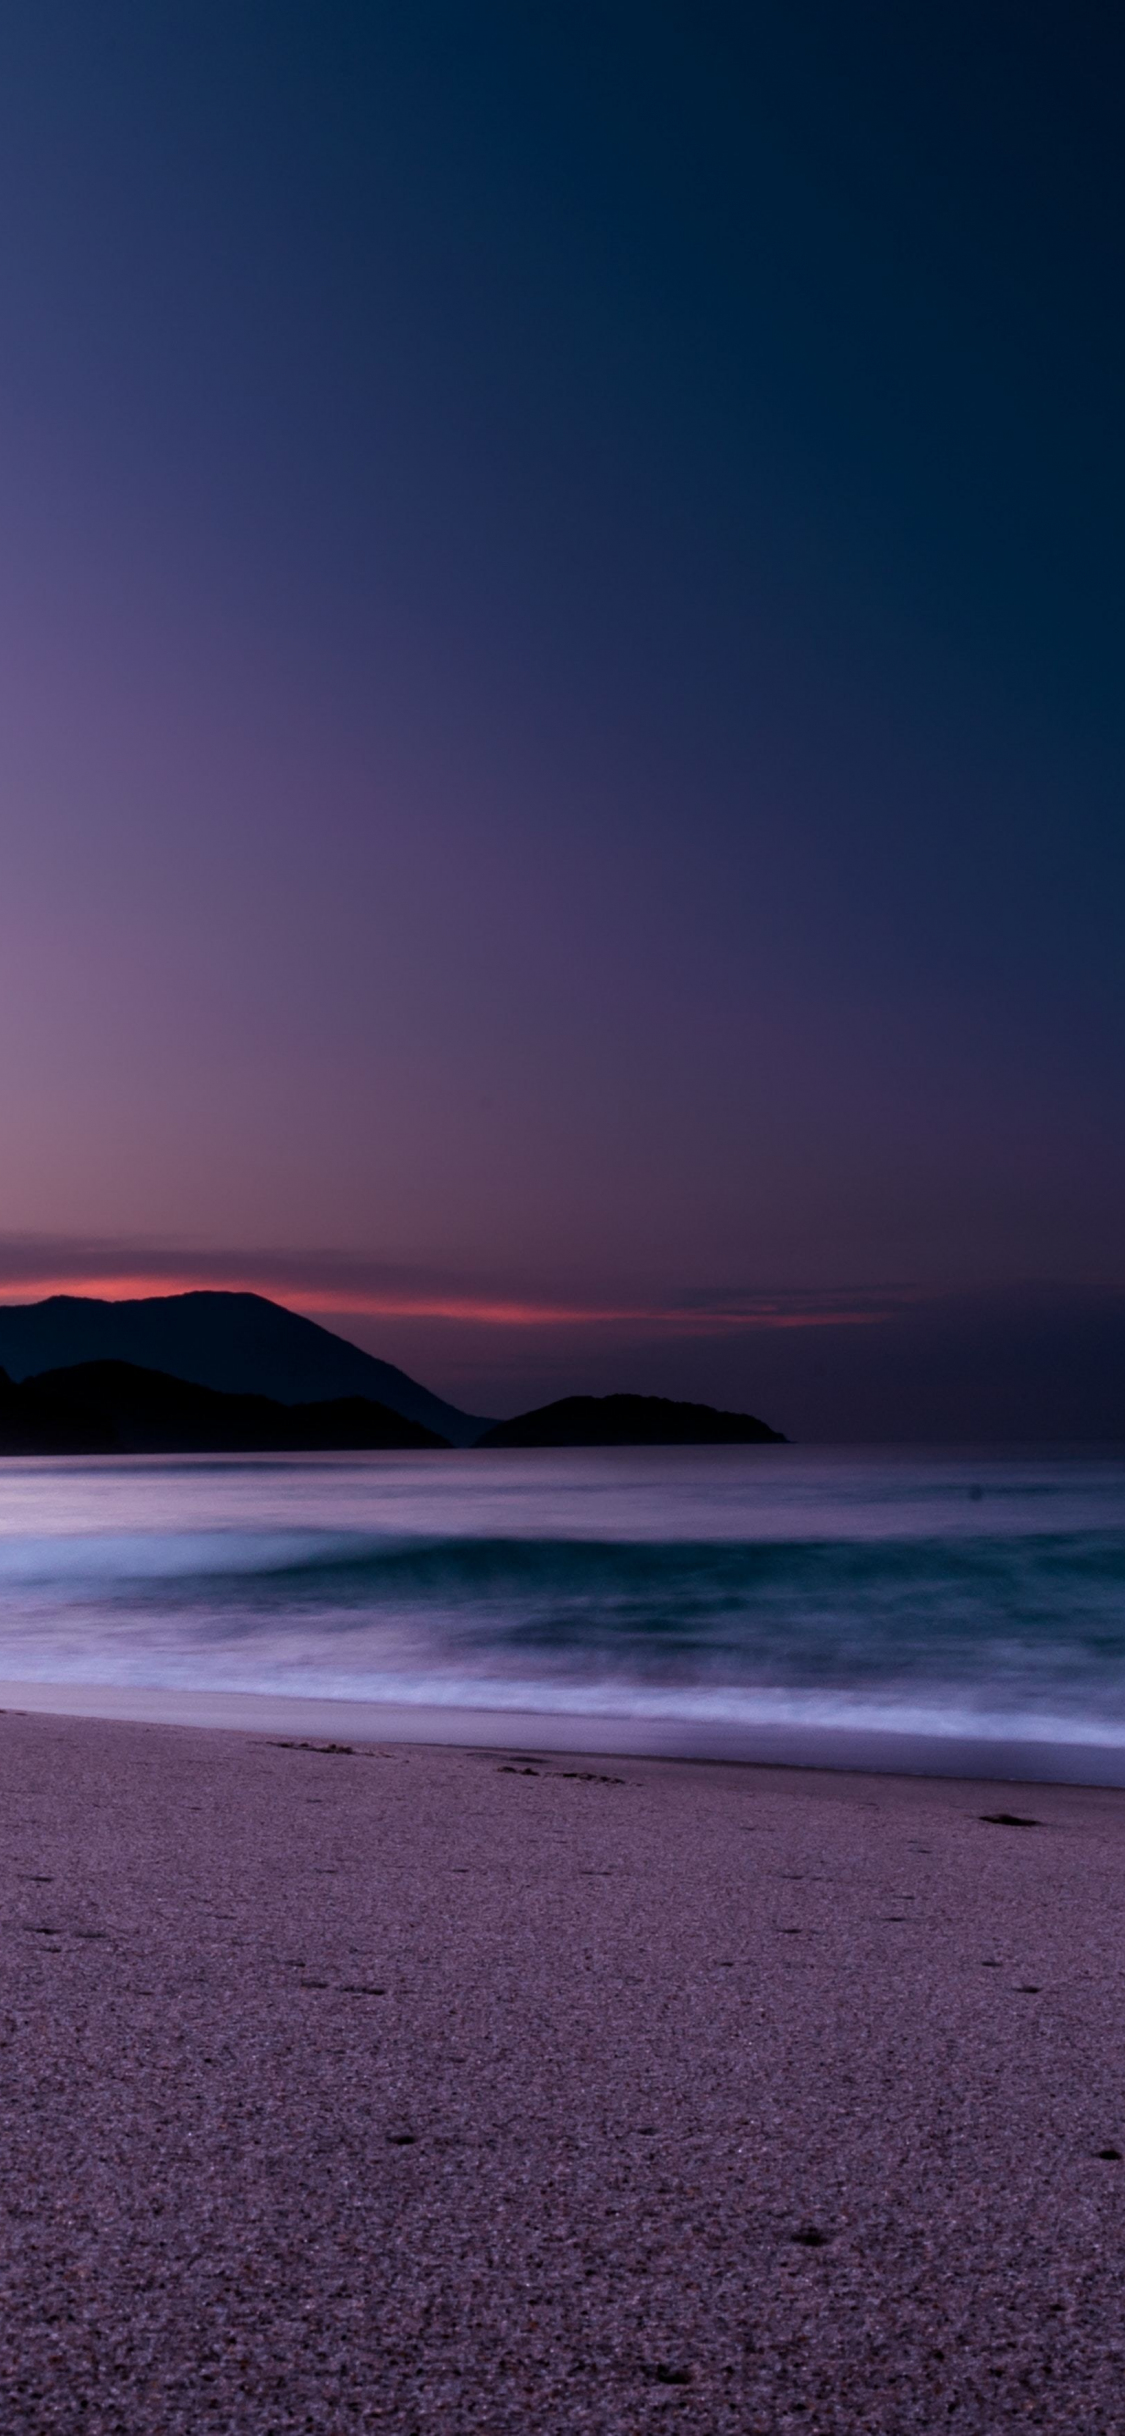 Download 1125x2436 Wallpaper Calm Beach Purple Sunset Iphone X